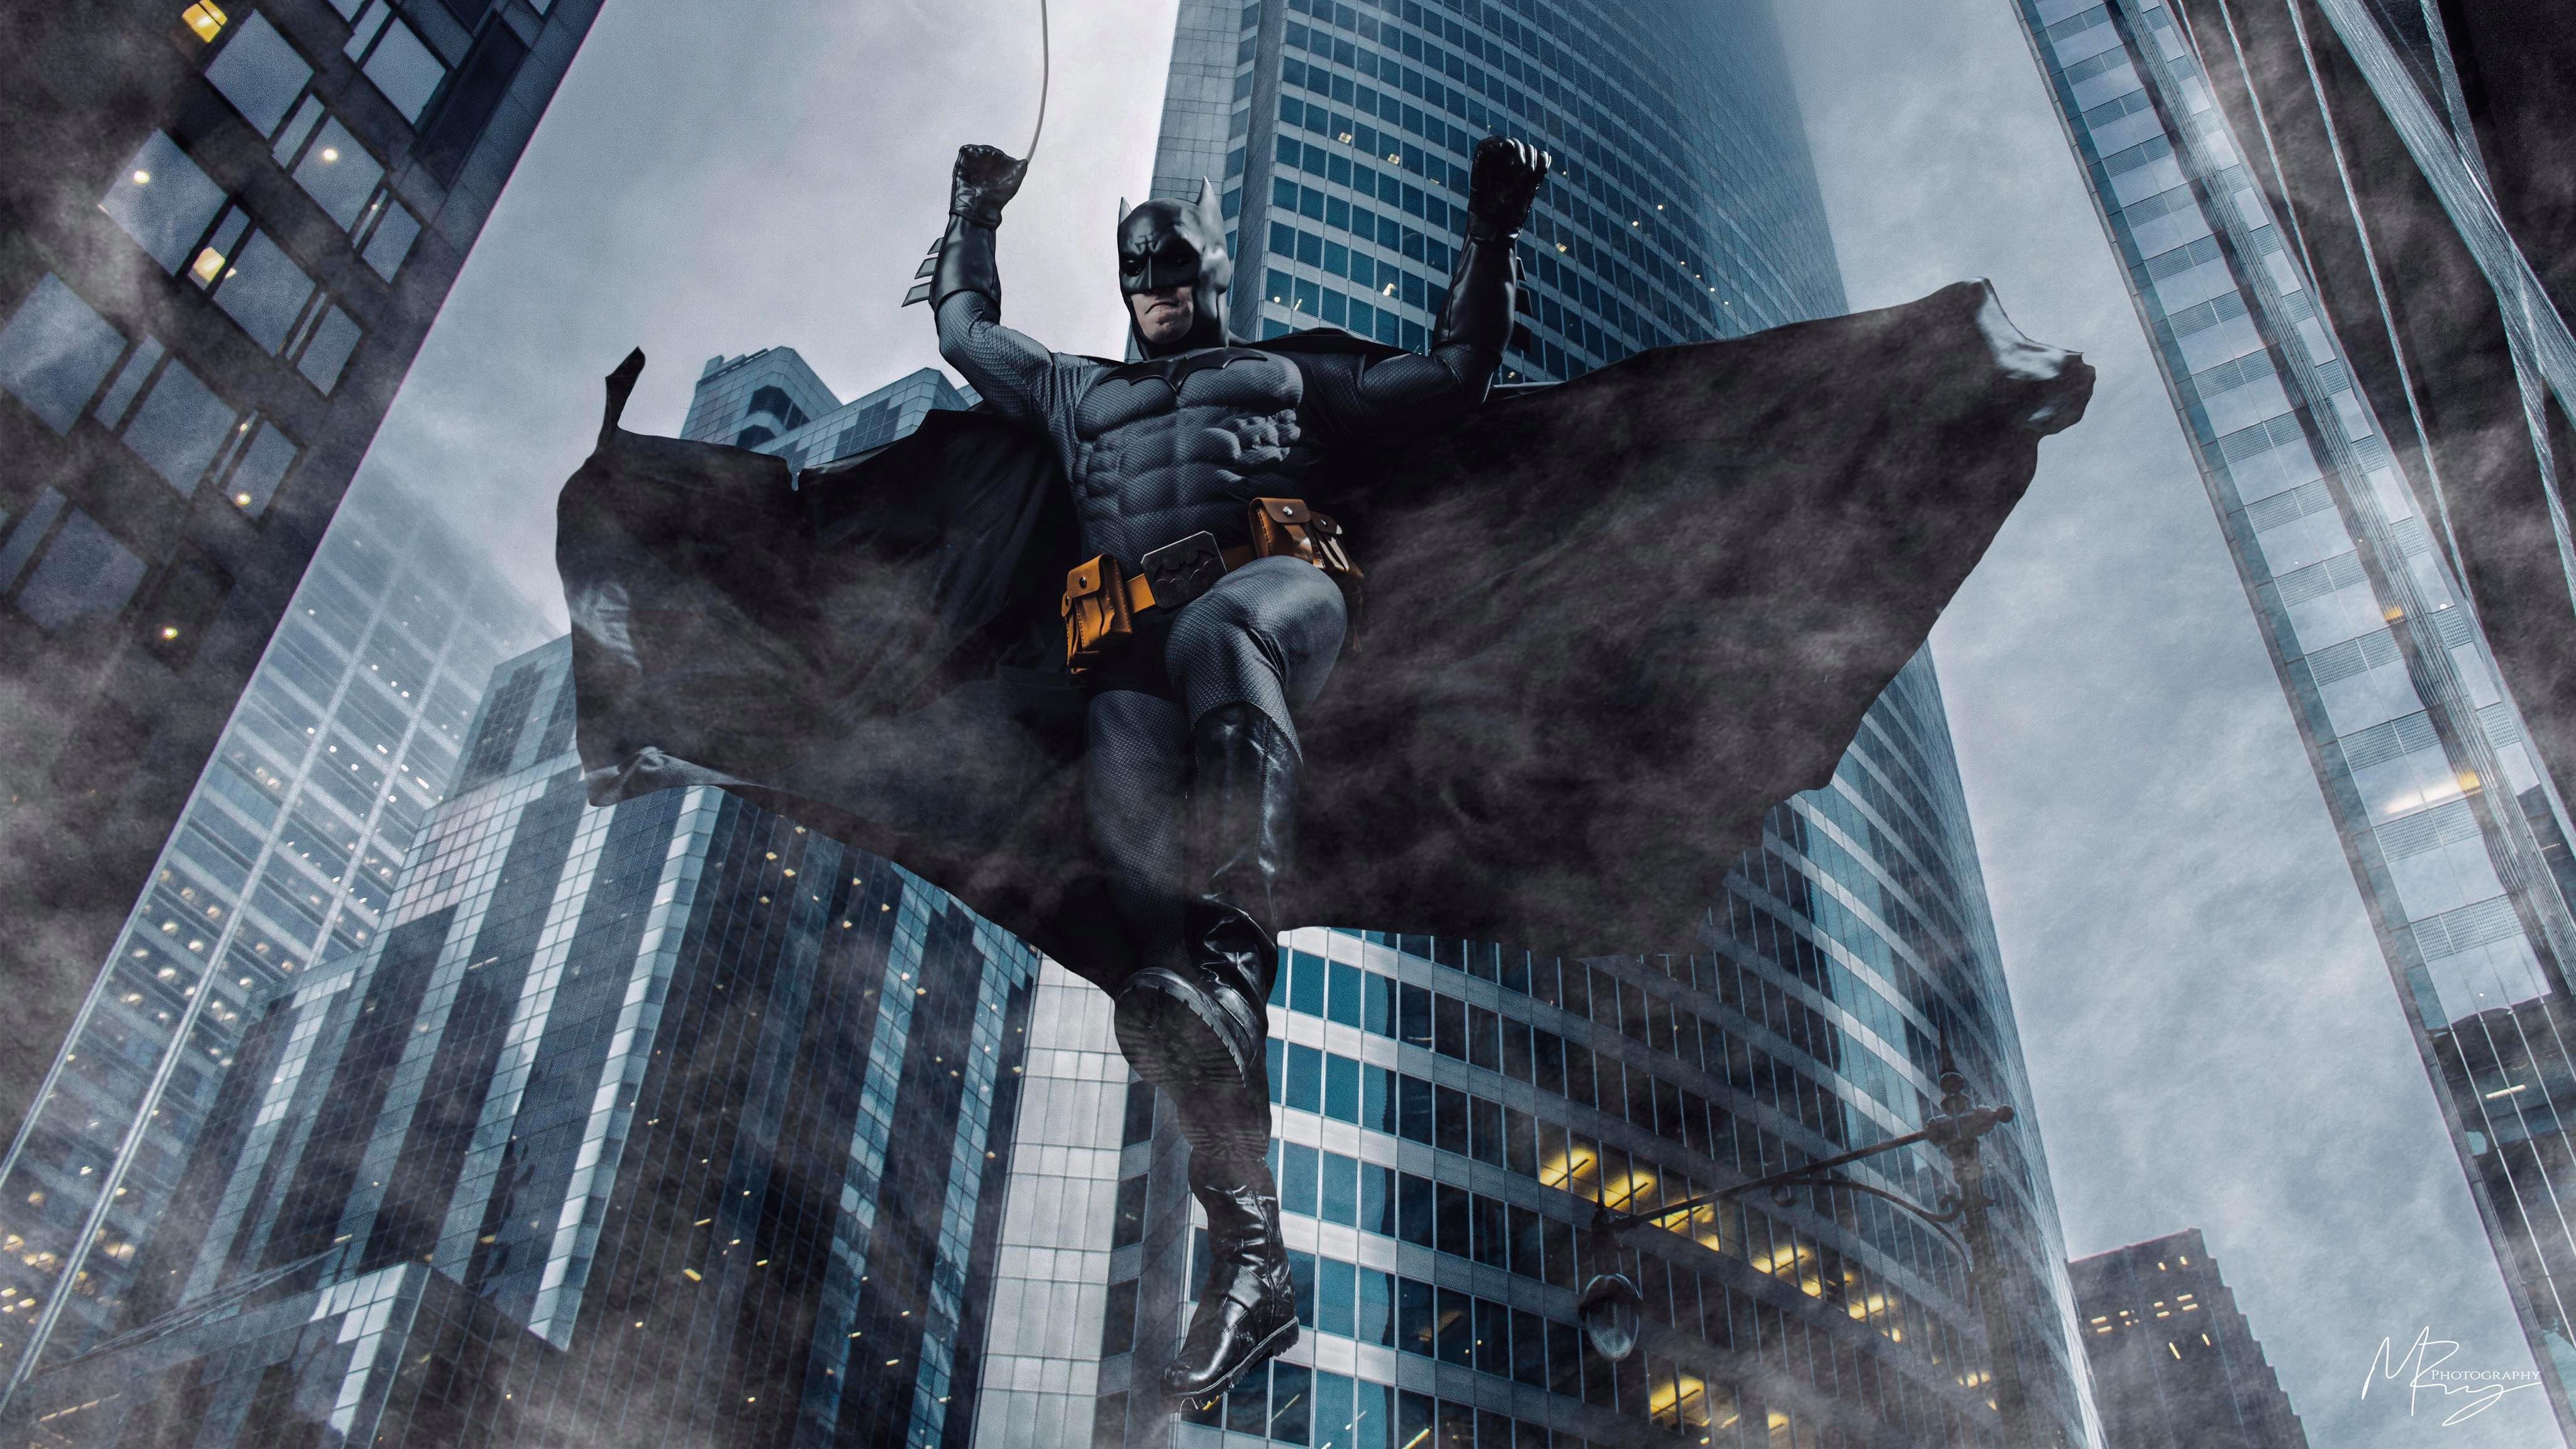 Wallpaper Batman falling of buildings